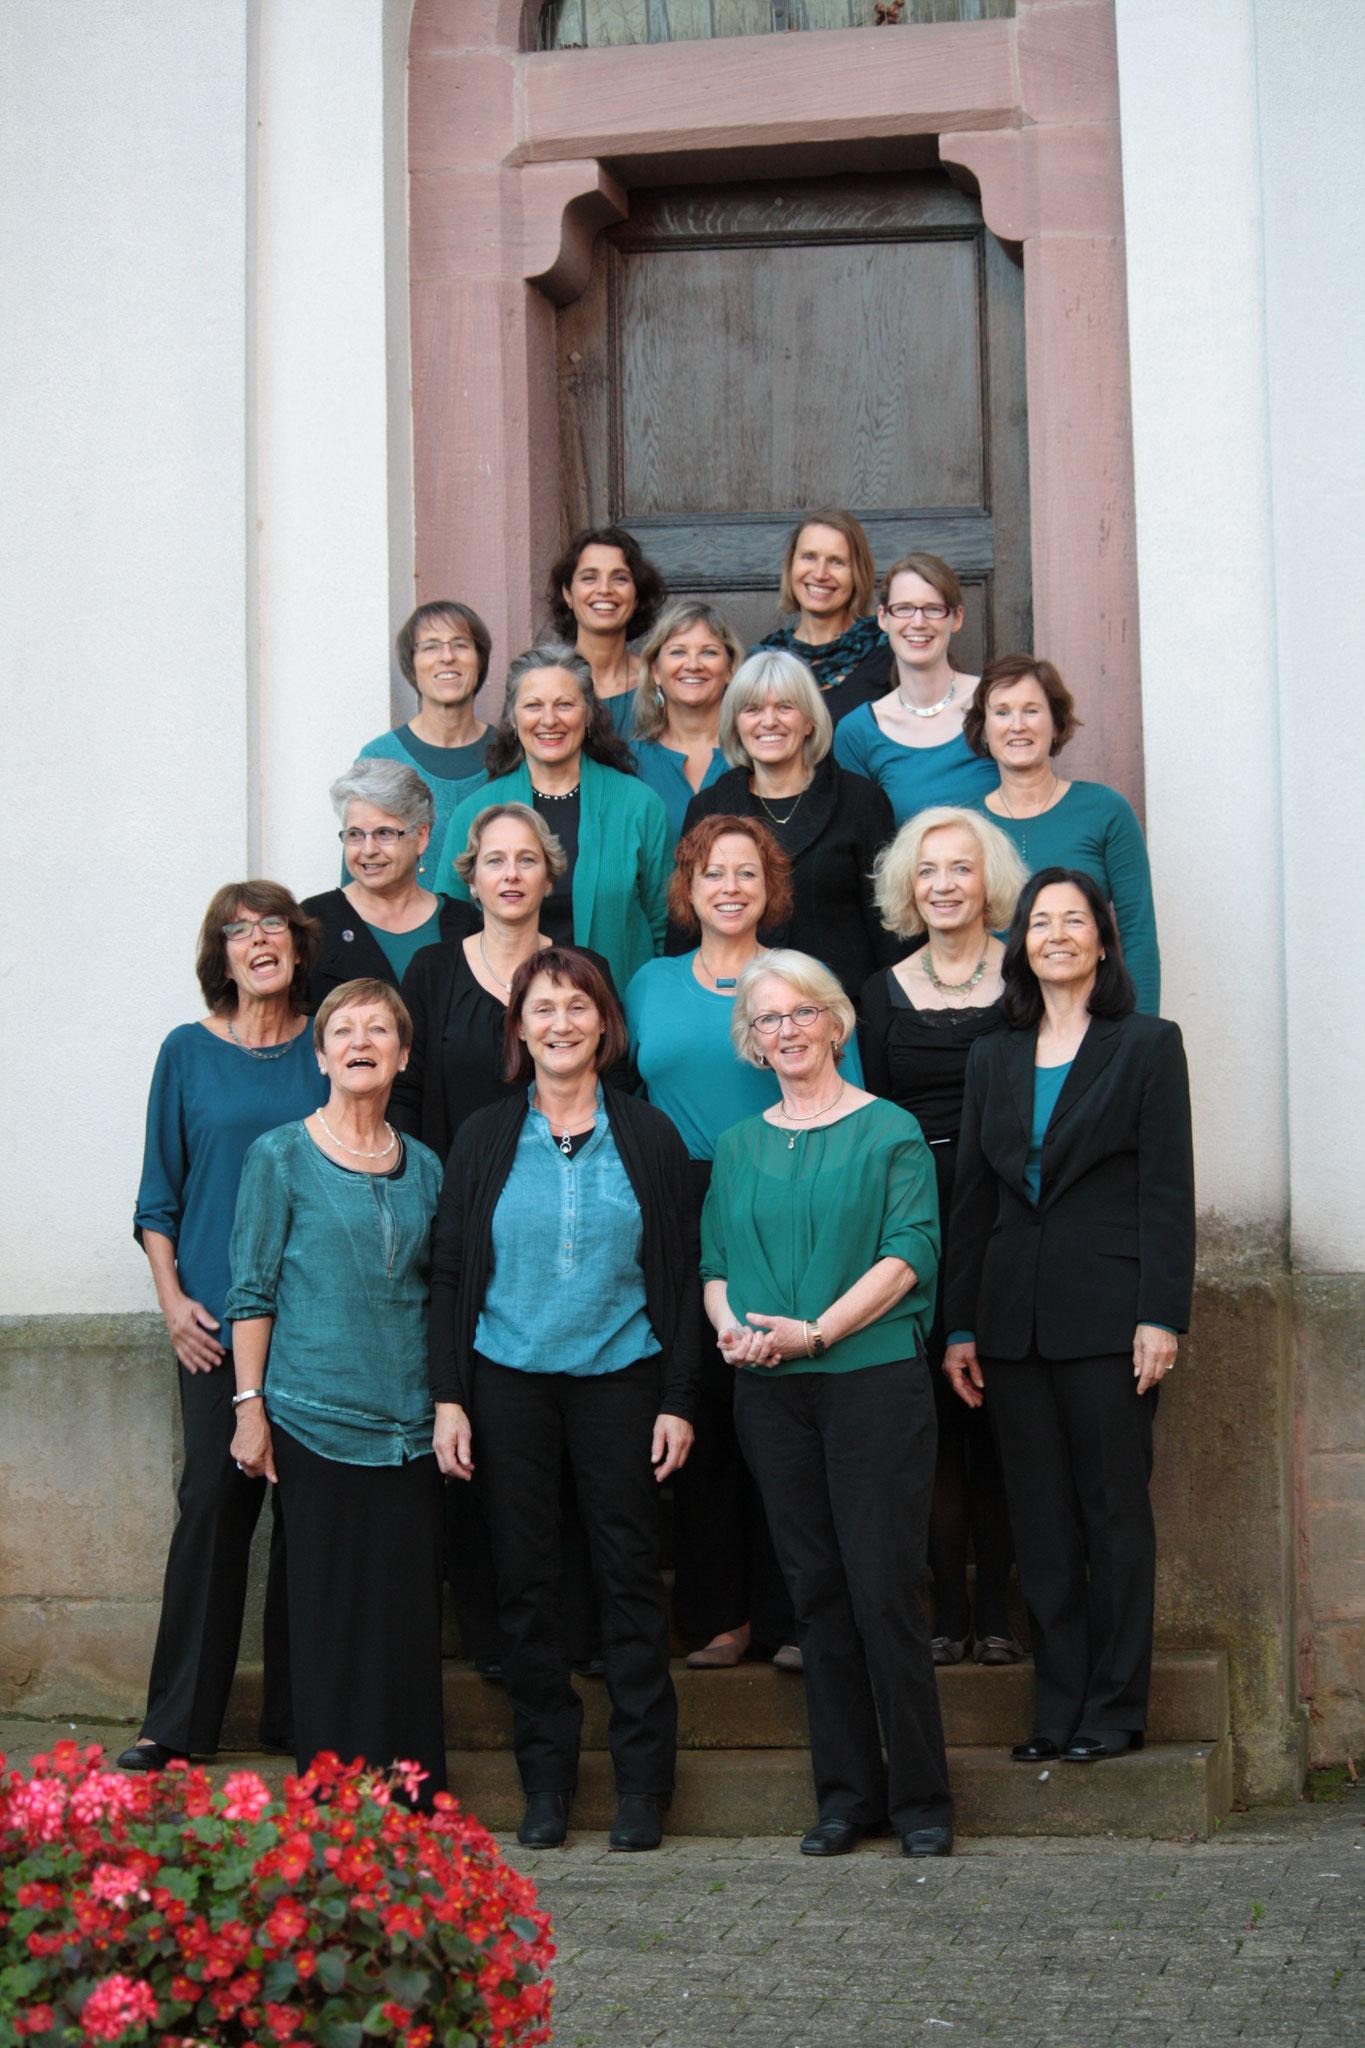 ... unser erstes Konzert in der Kirche in Mengen (2013)